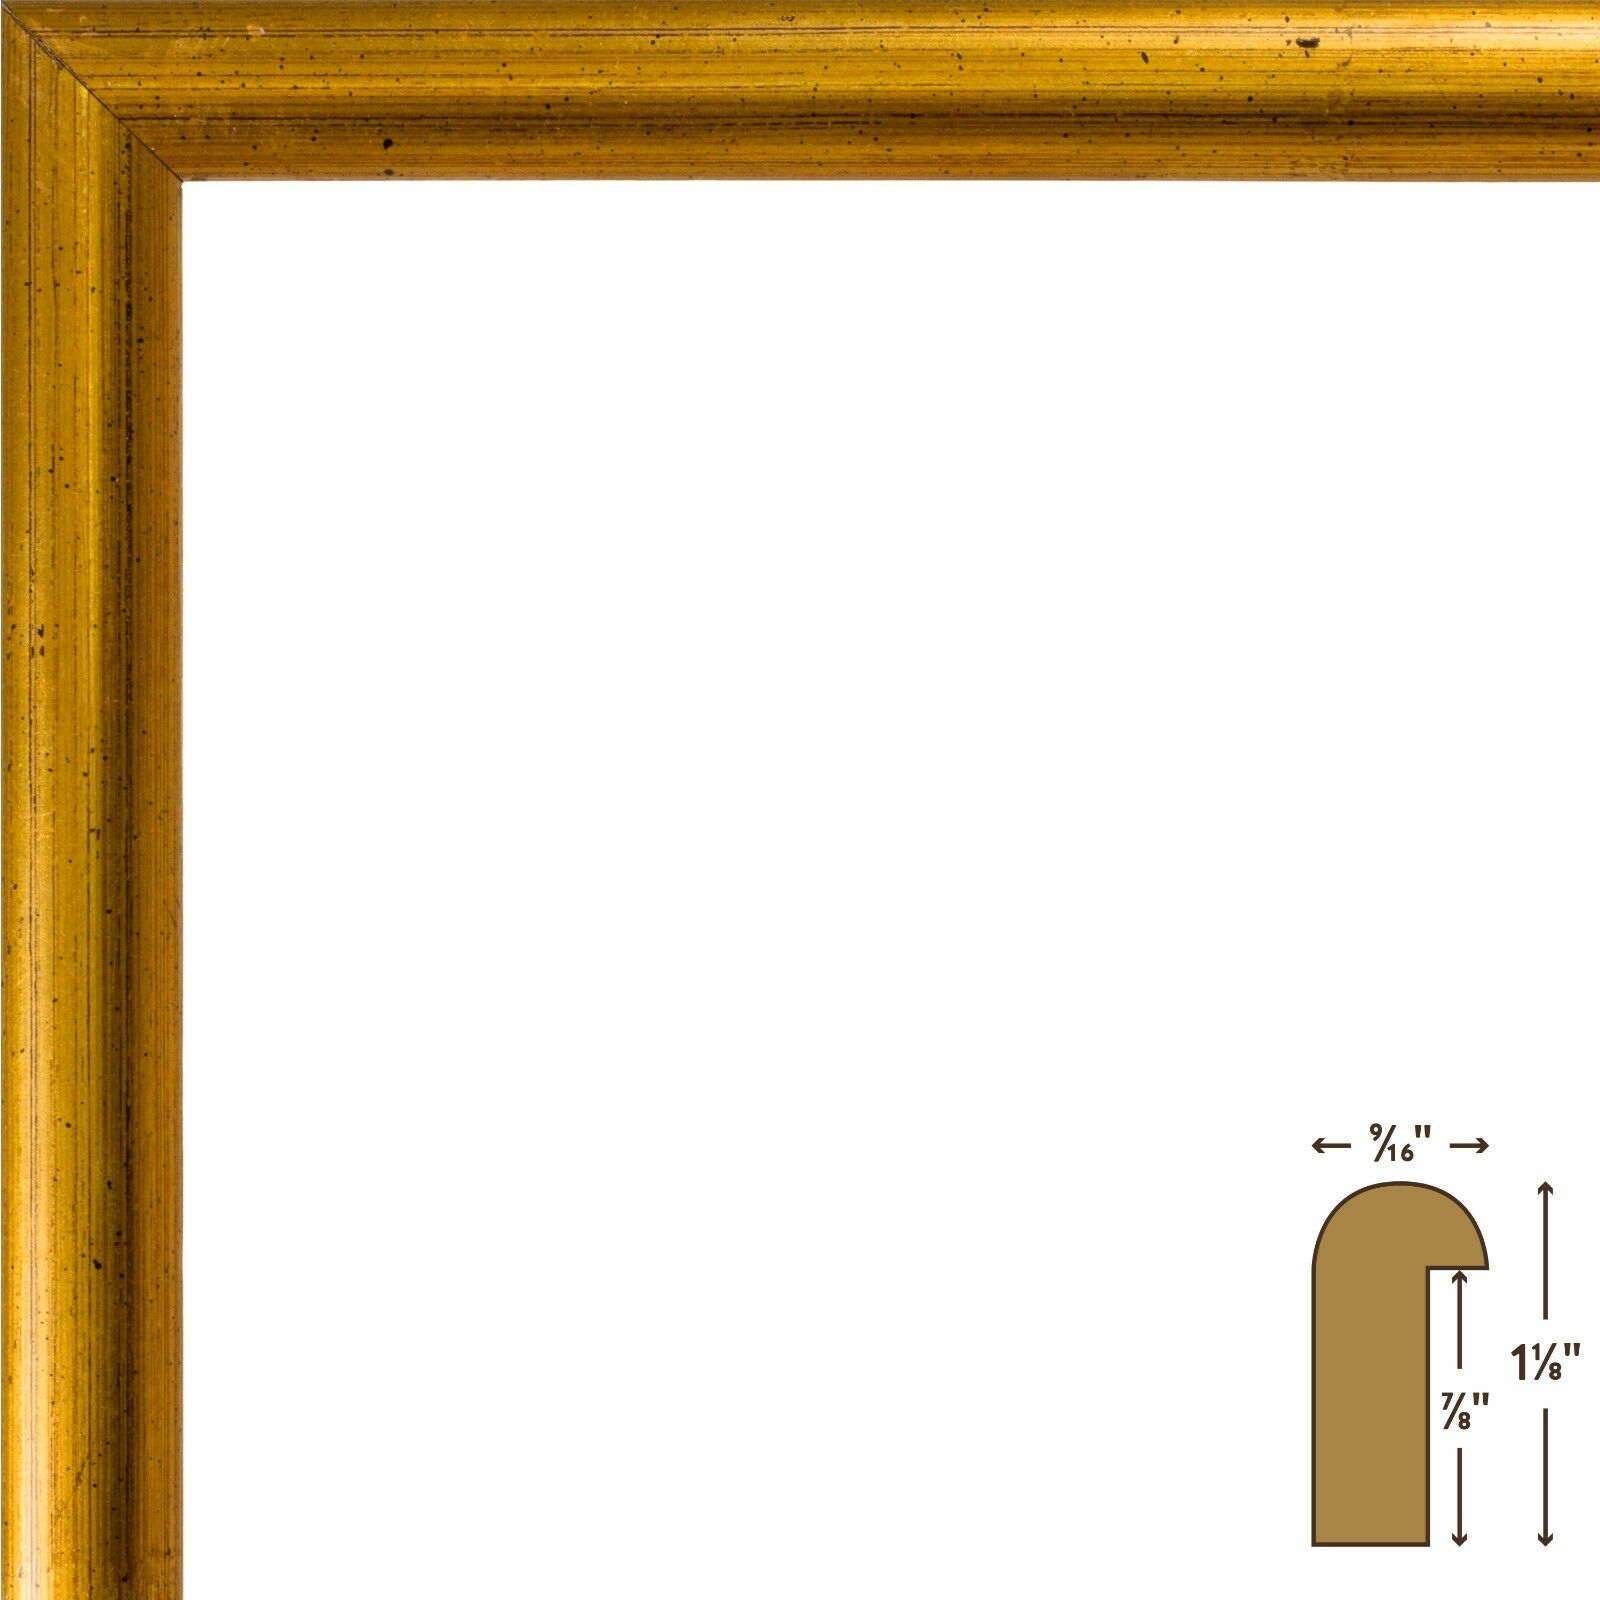 Craig Frames Dakota Bullnose Antique Gold Wood Picture Frame 24x32 ...